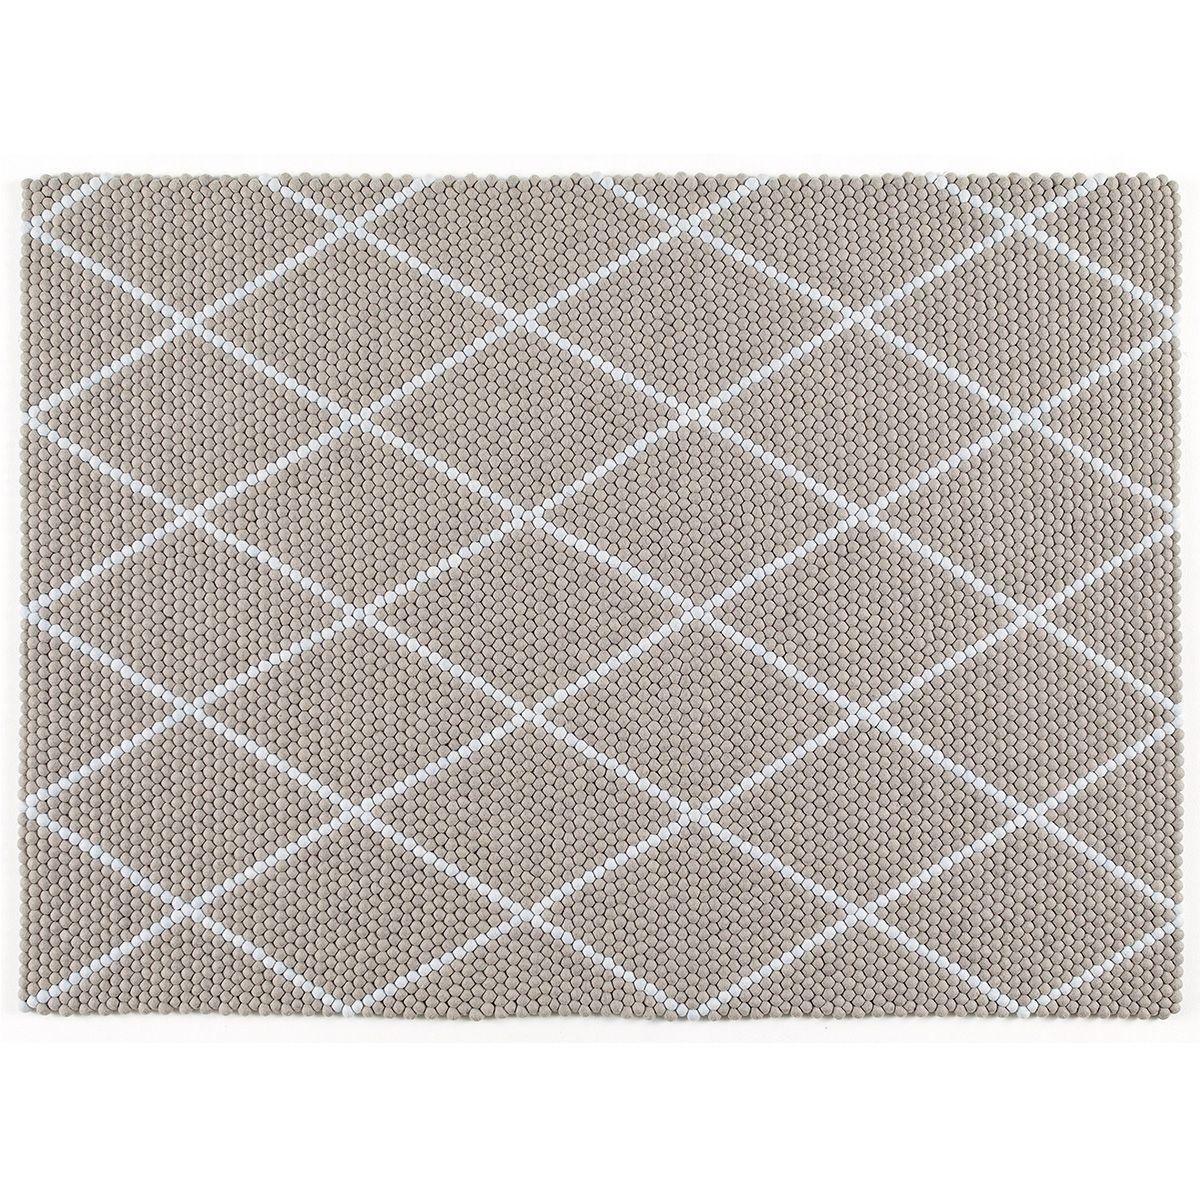 Hay Teppich hay teppich dot carpet glacier silt 200cm x 150cm teppiche rugs